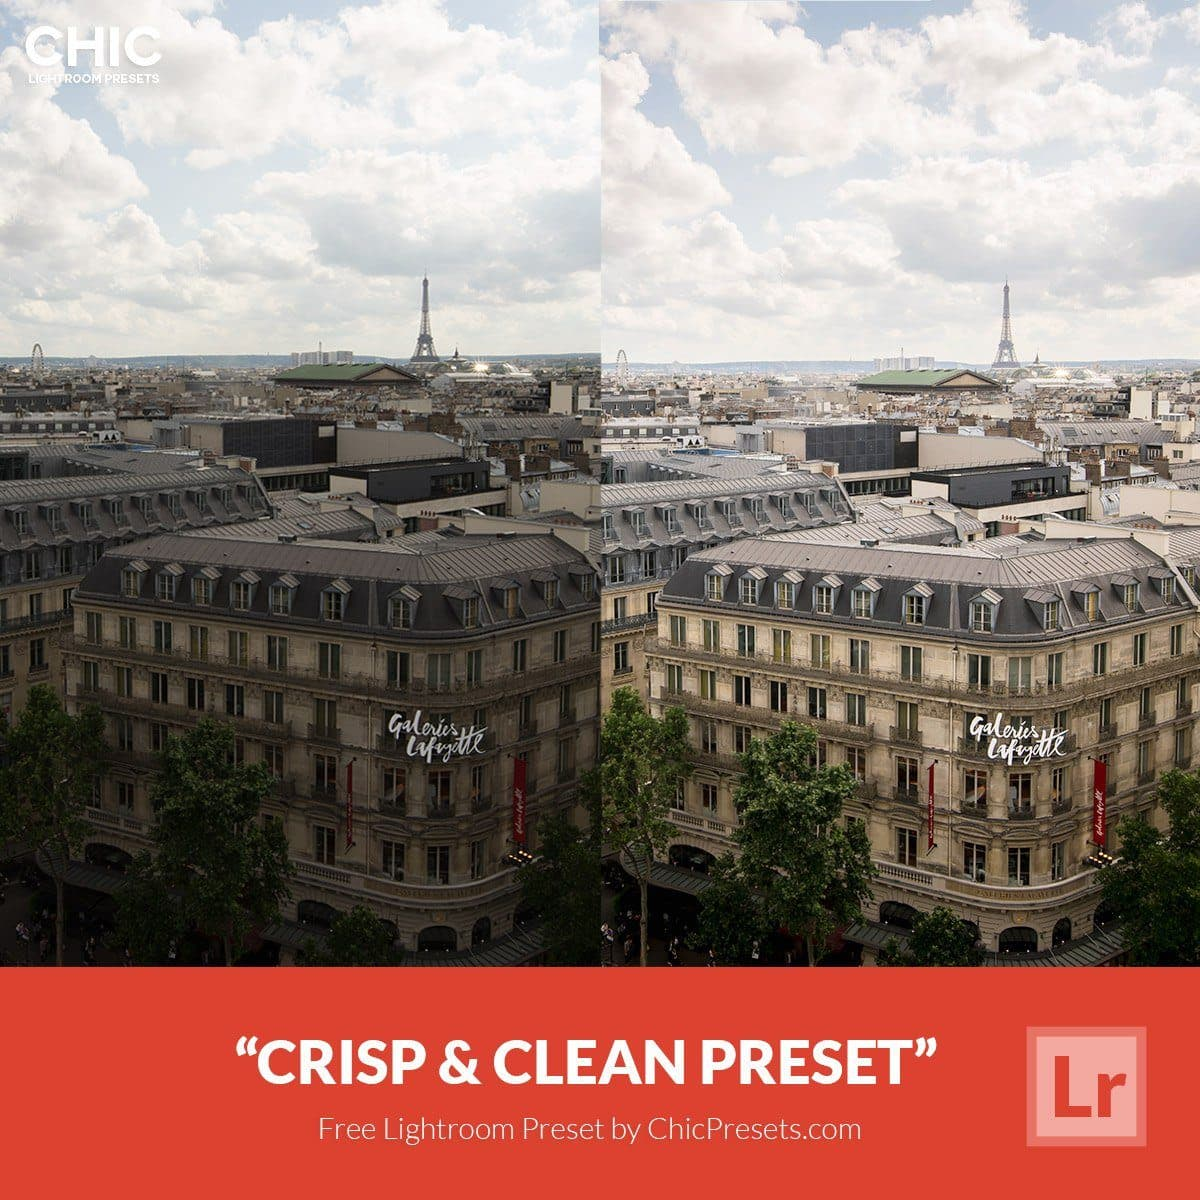 Free-Lightroom-Preset-Crisp-Clean-Chic-Presets